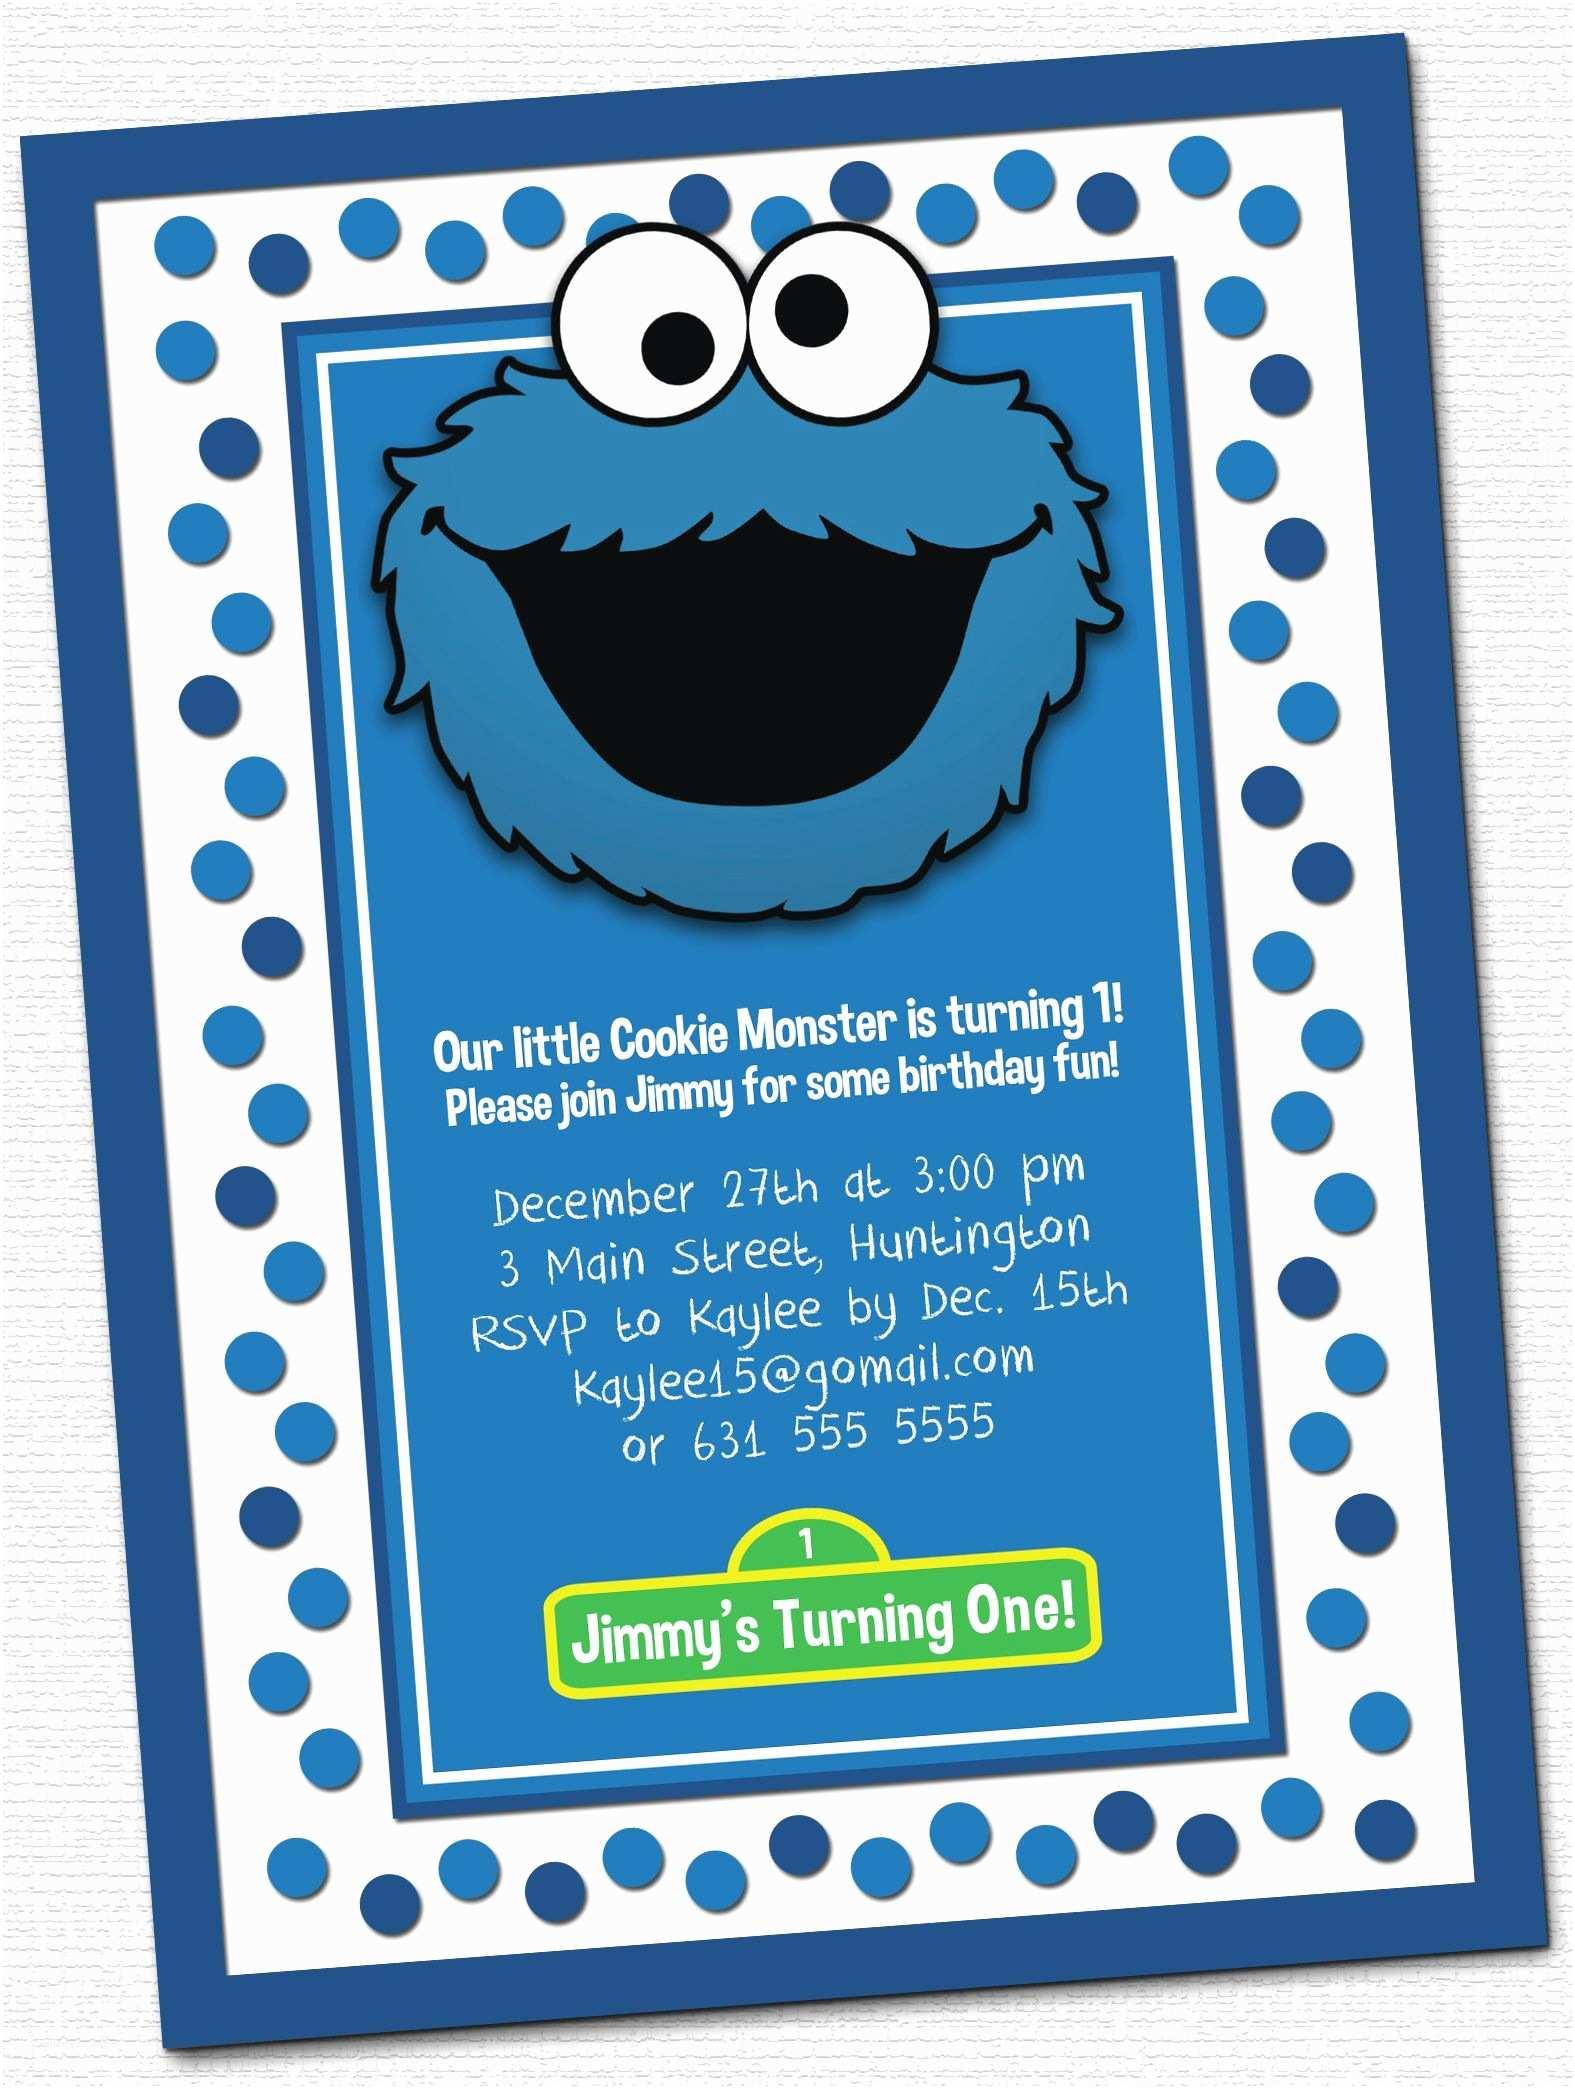 Monster Party Invitations Cookie Monster Invitations Little Rj